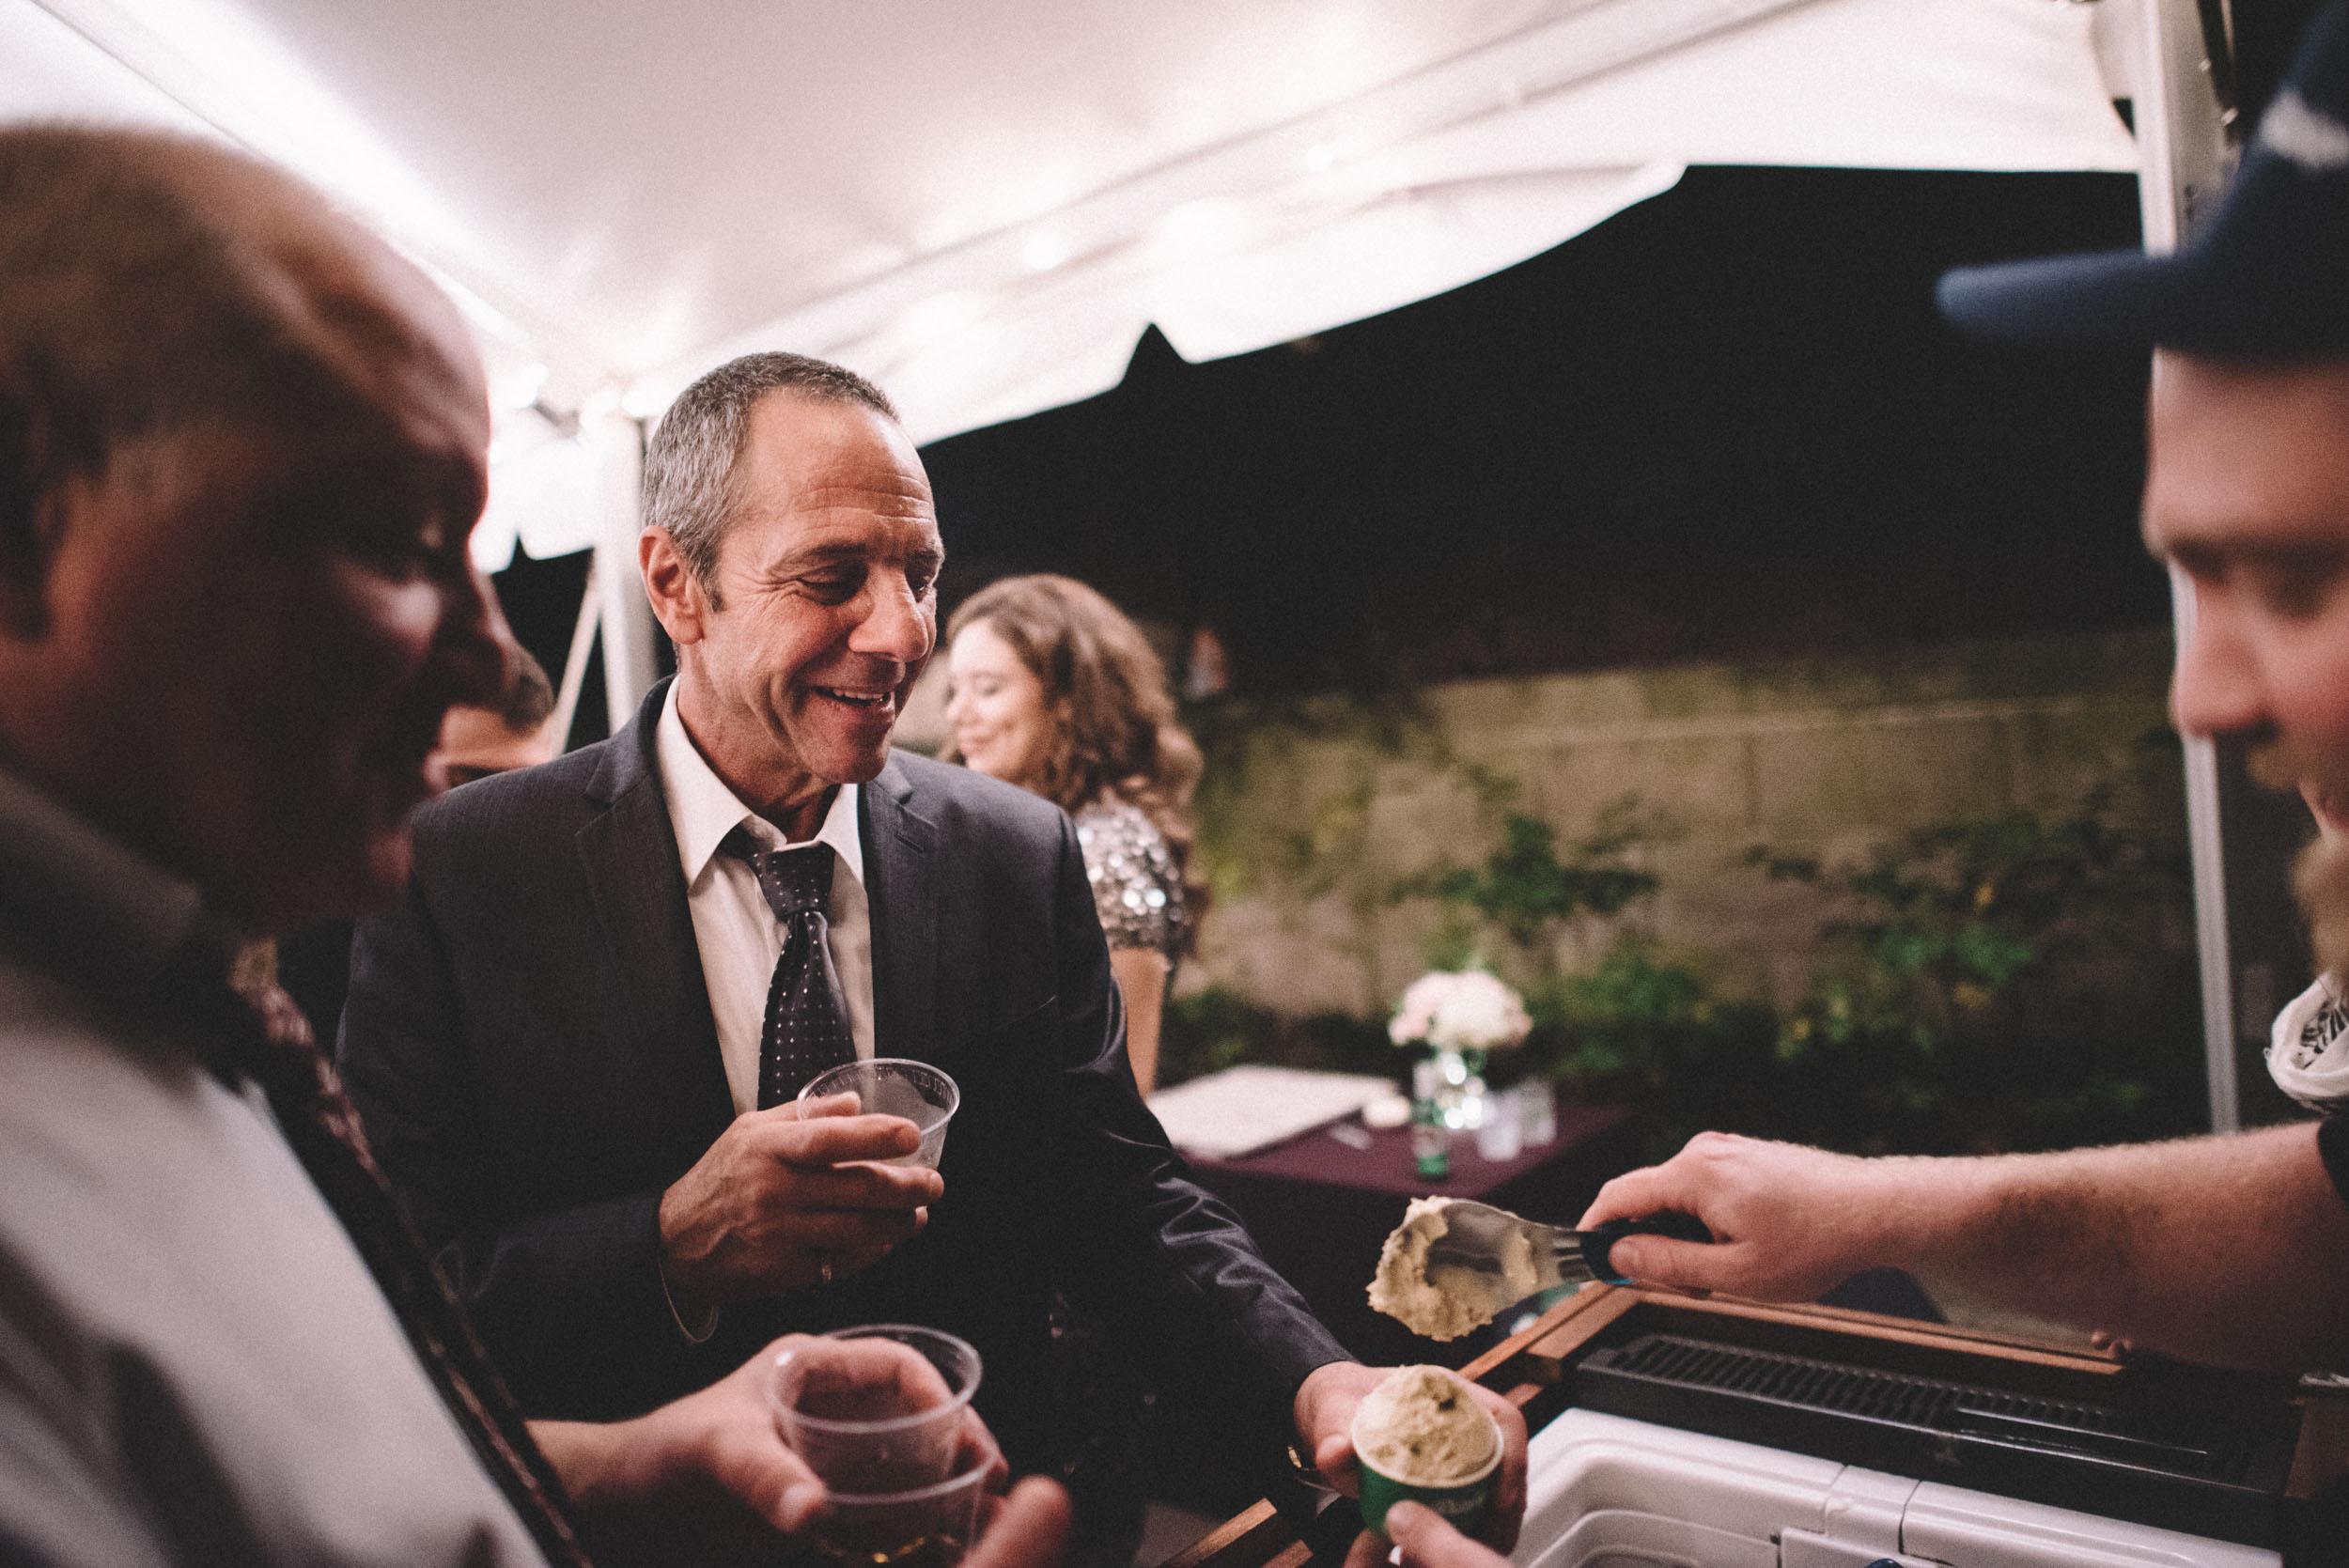 Dumbarton-House-wedding-99.jpg